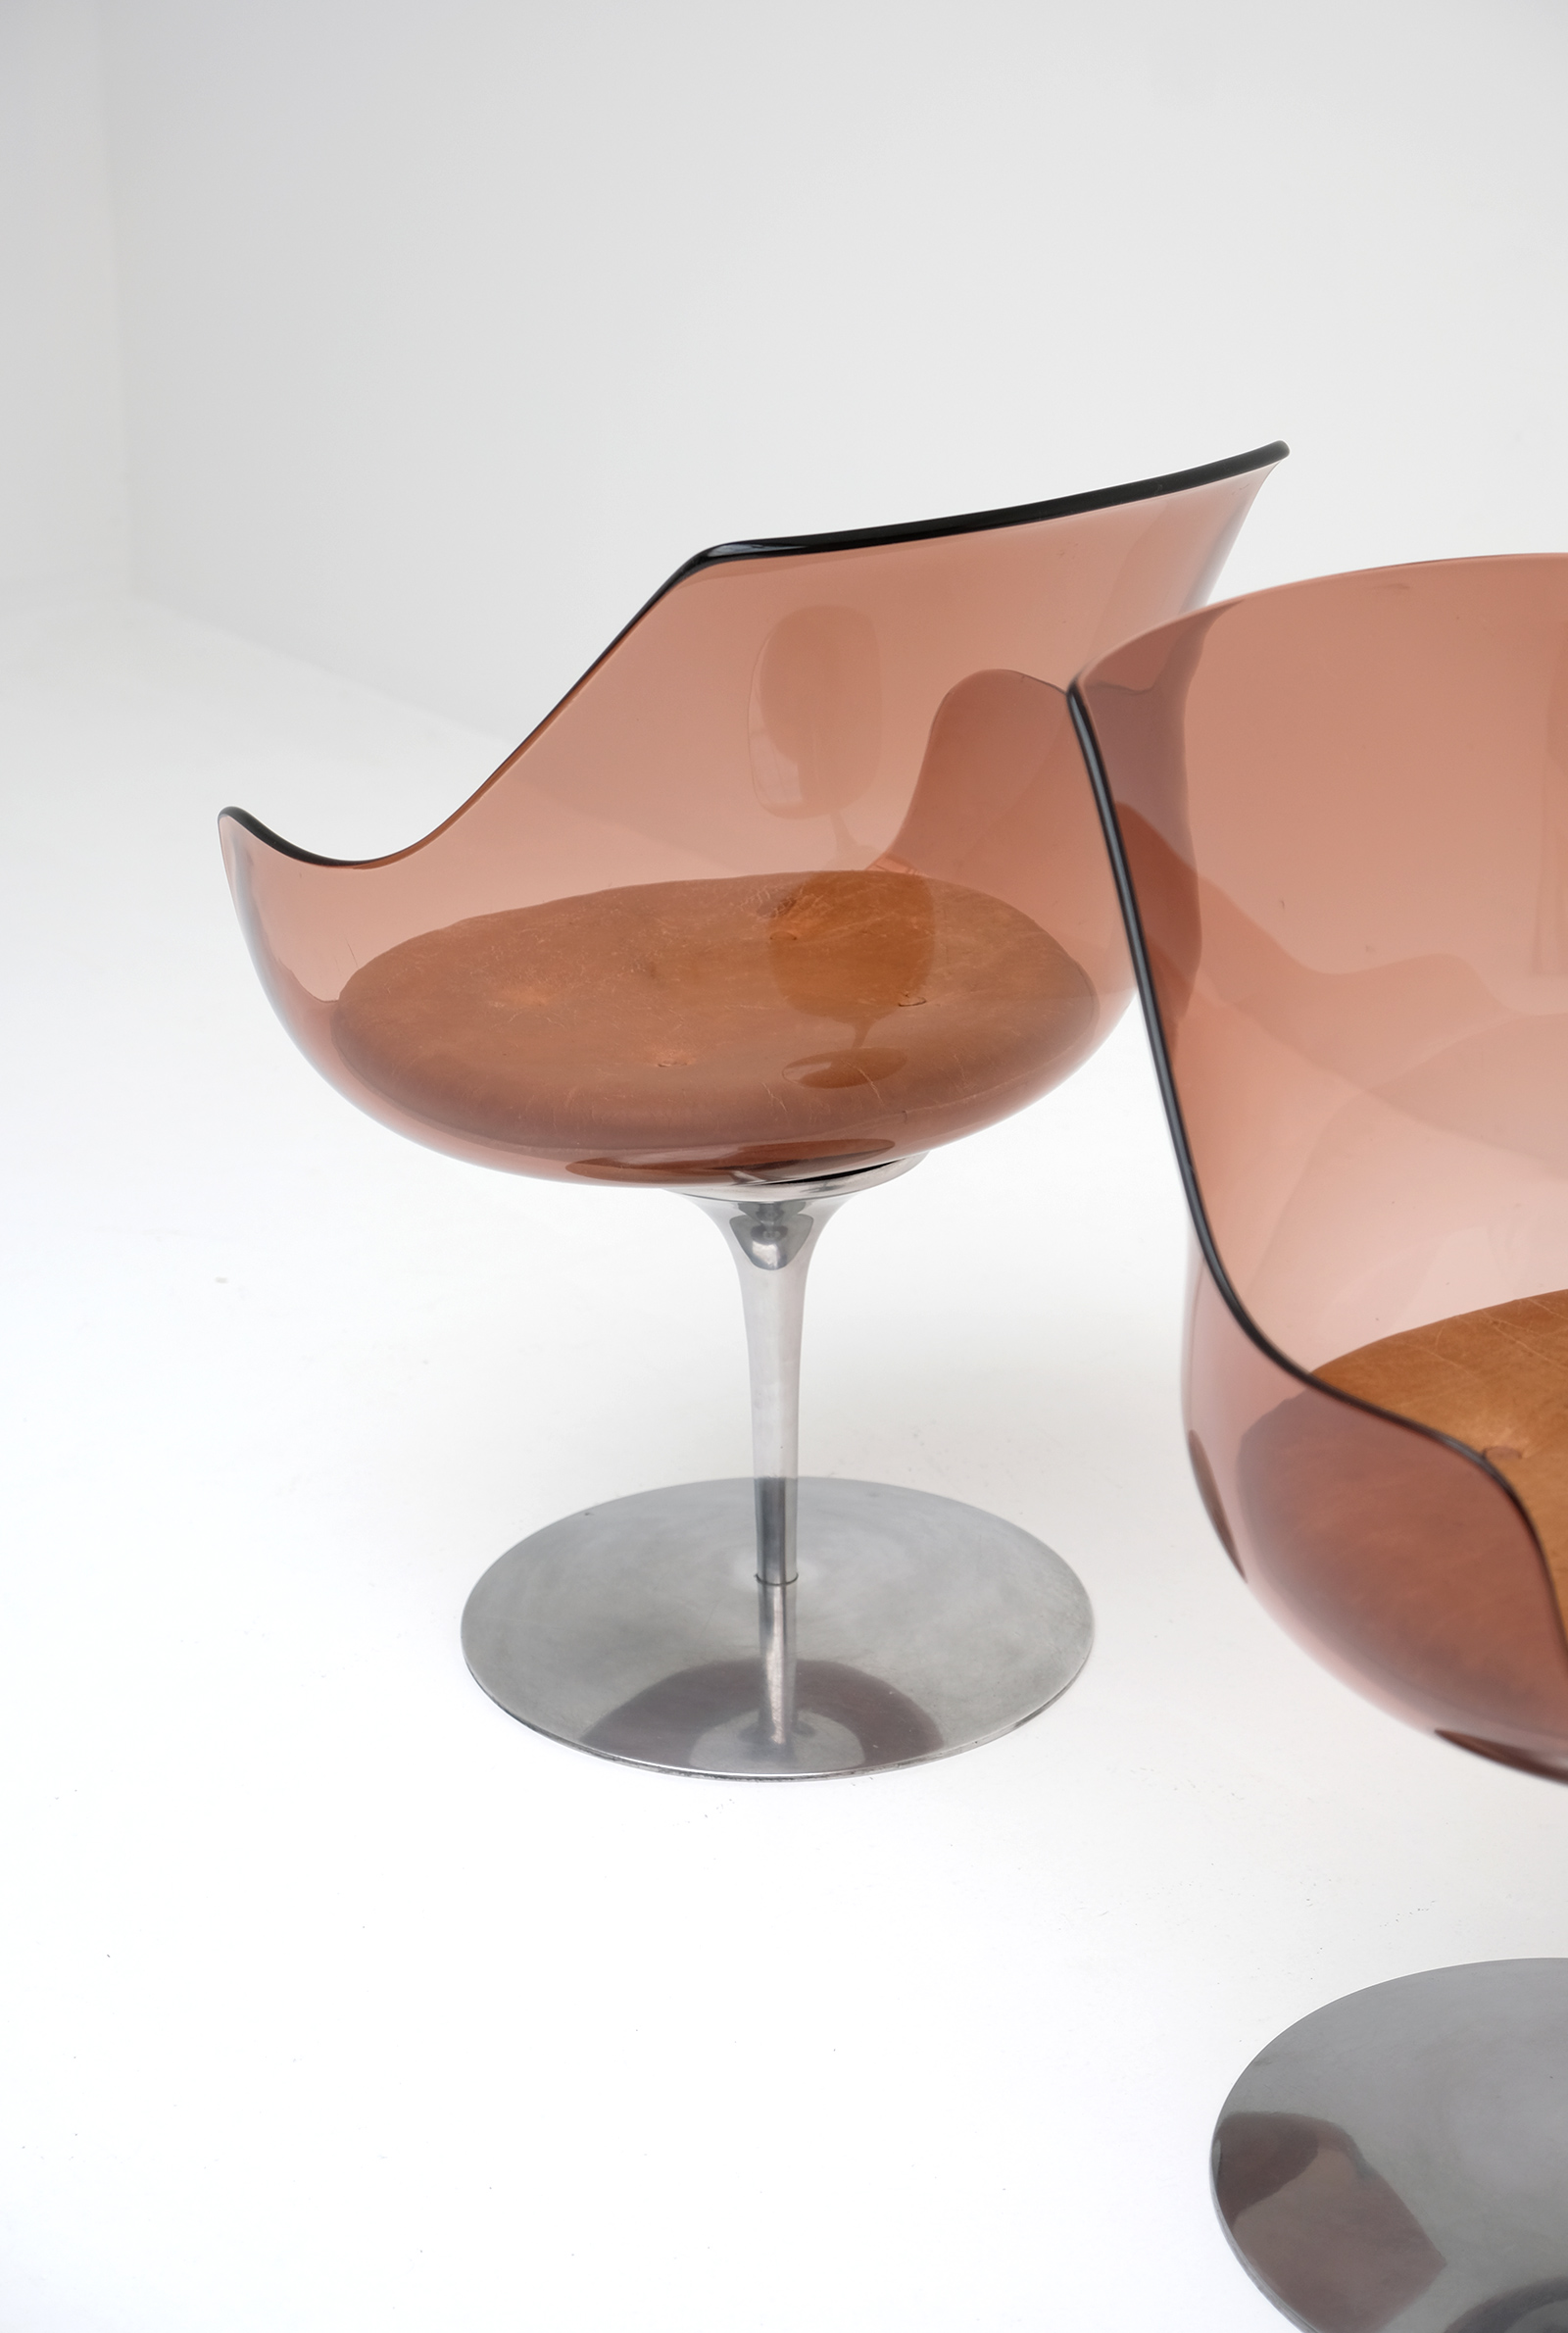 Laverne Champagne Chairs Formes Nouvellesimage 8